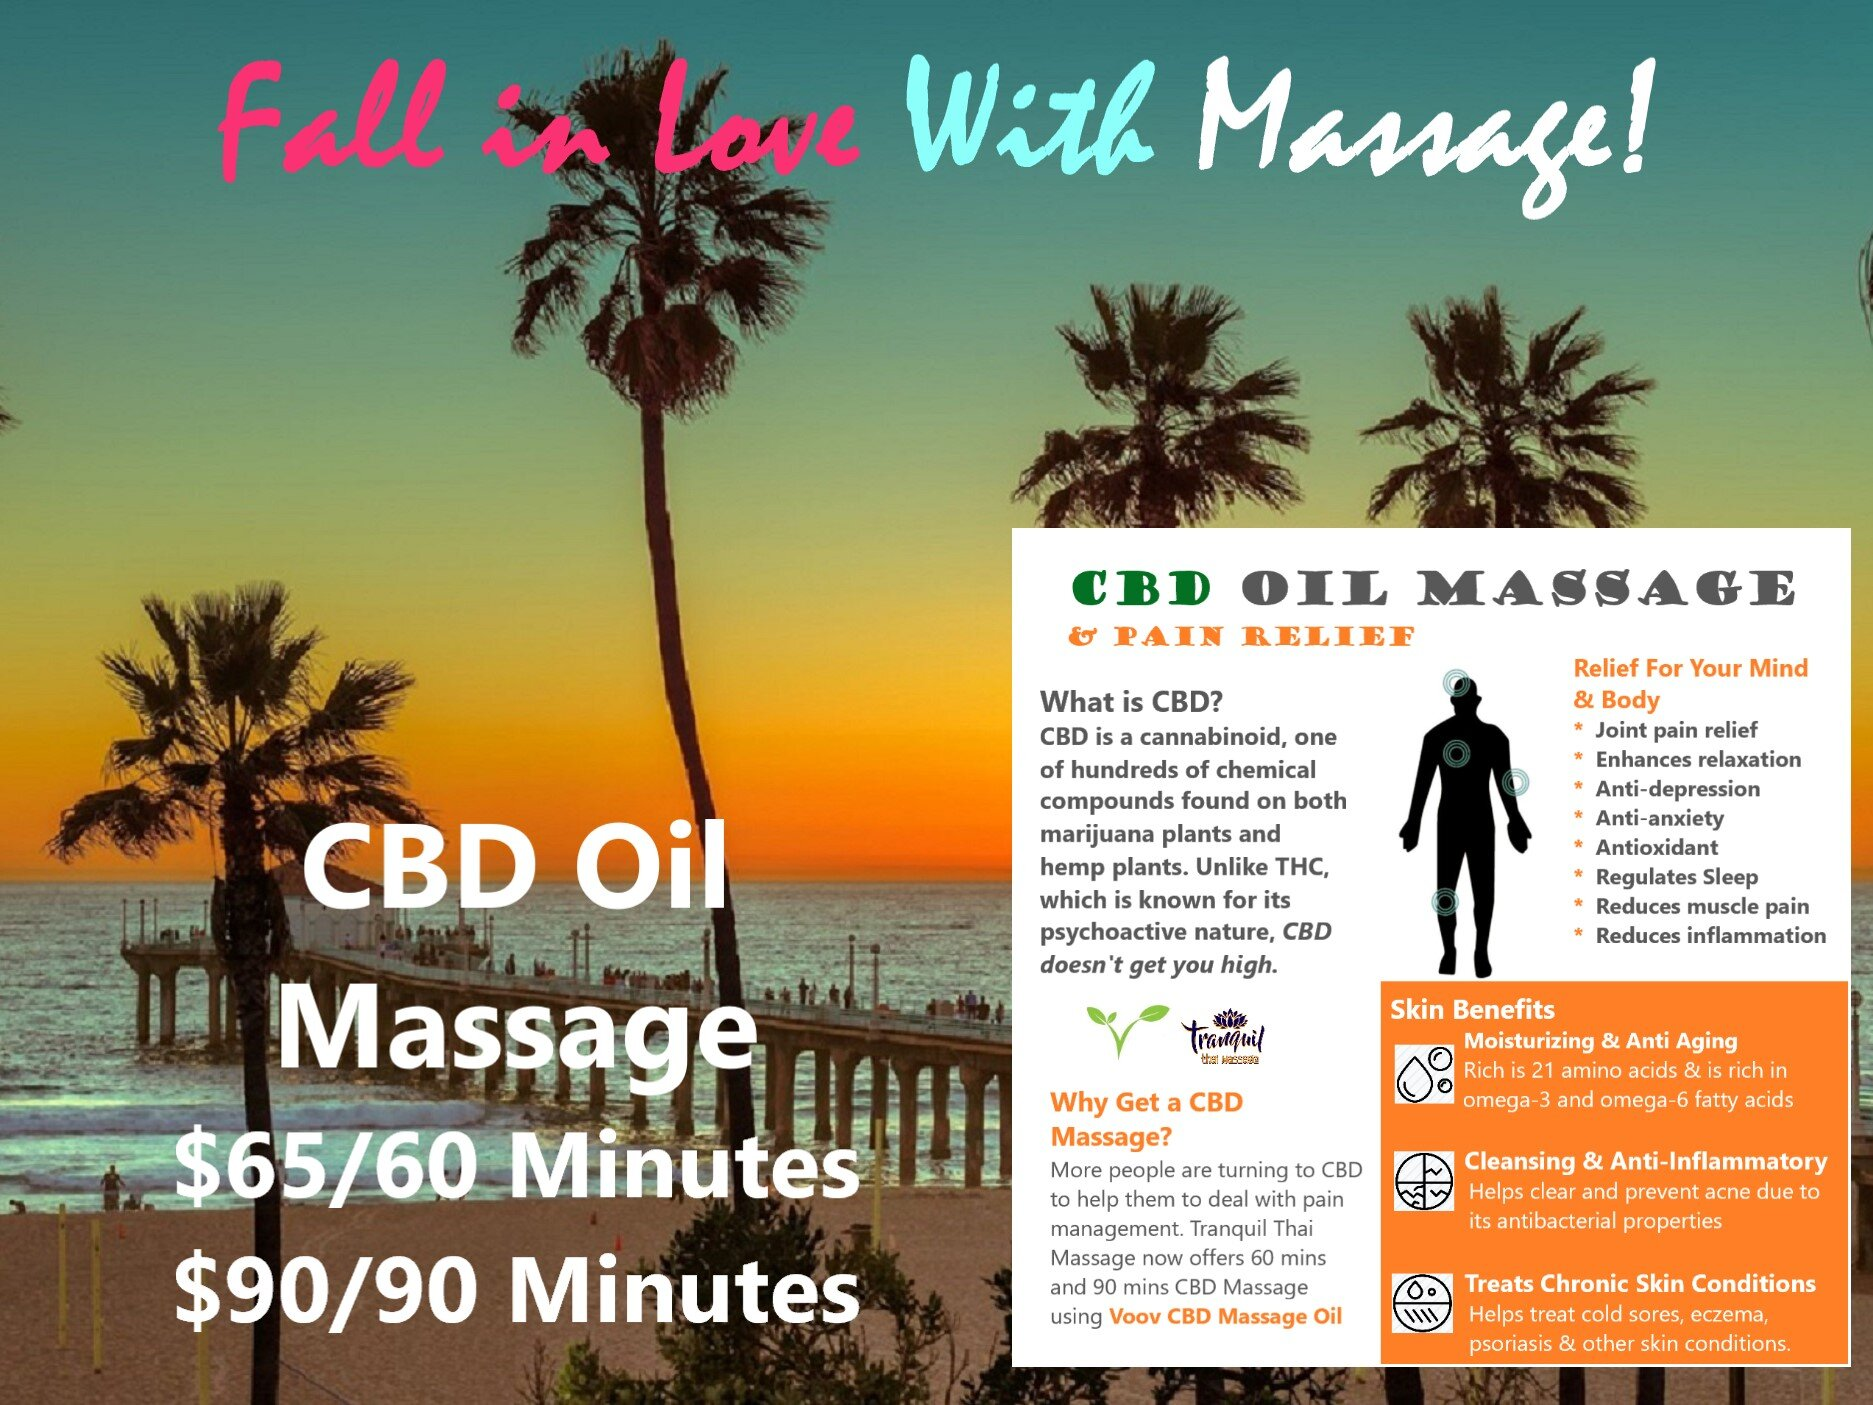 CBD Oil Massage.jpg